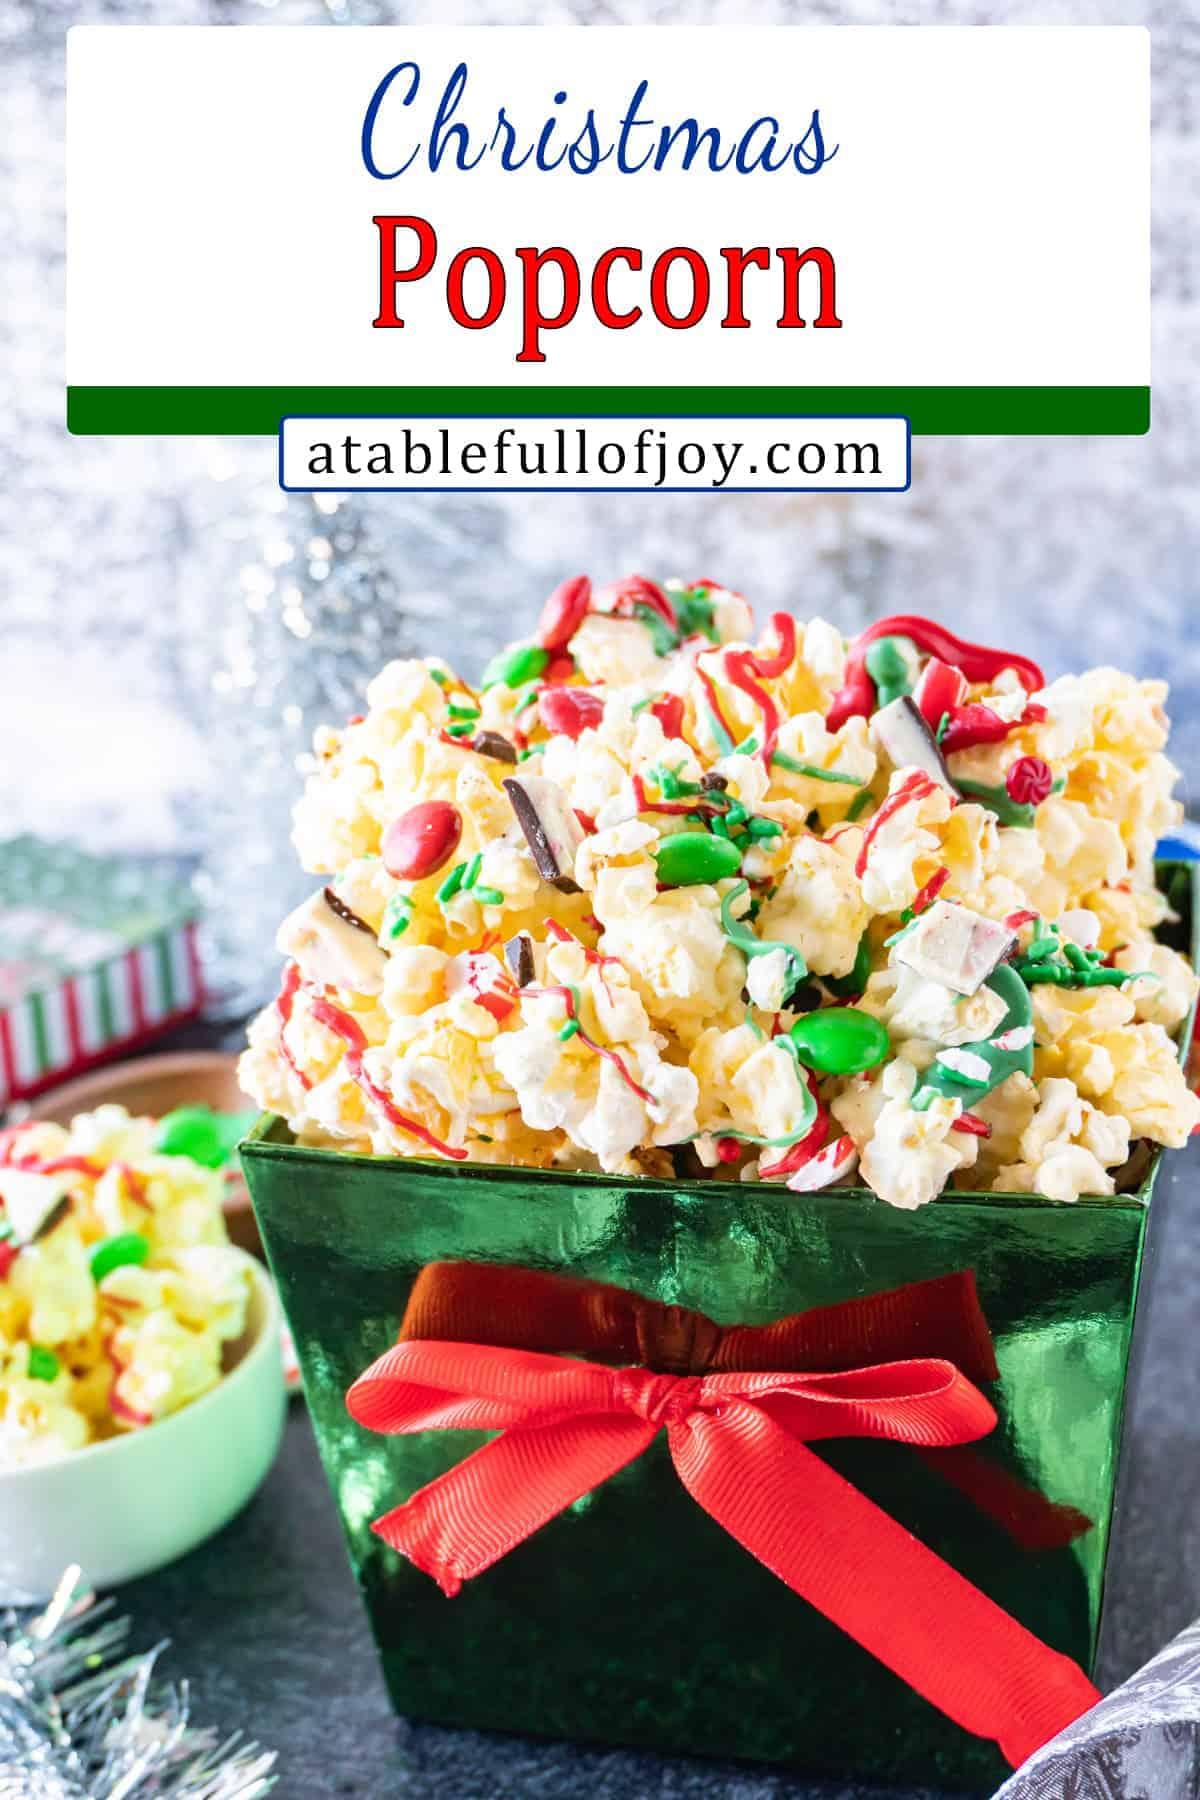 Holiday Popcorn pinterest pin